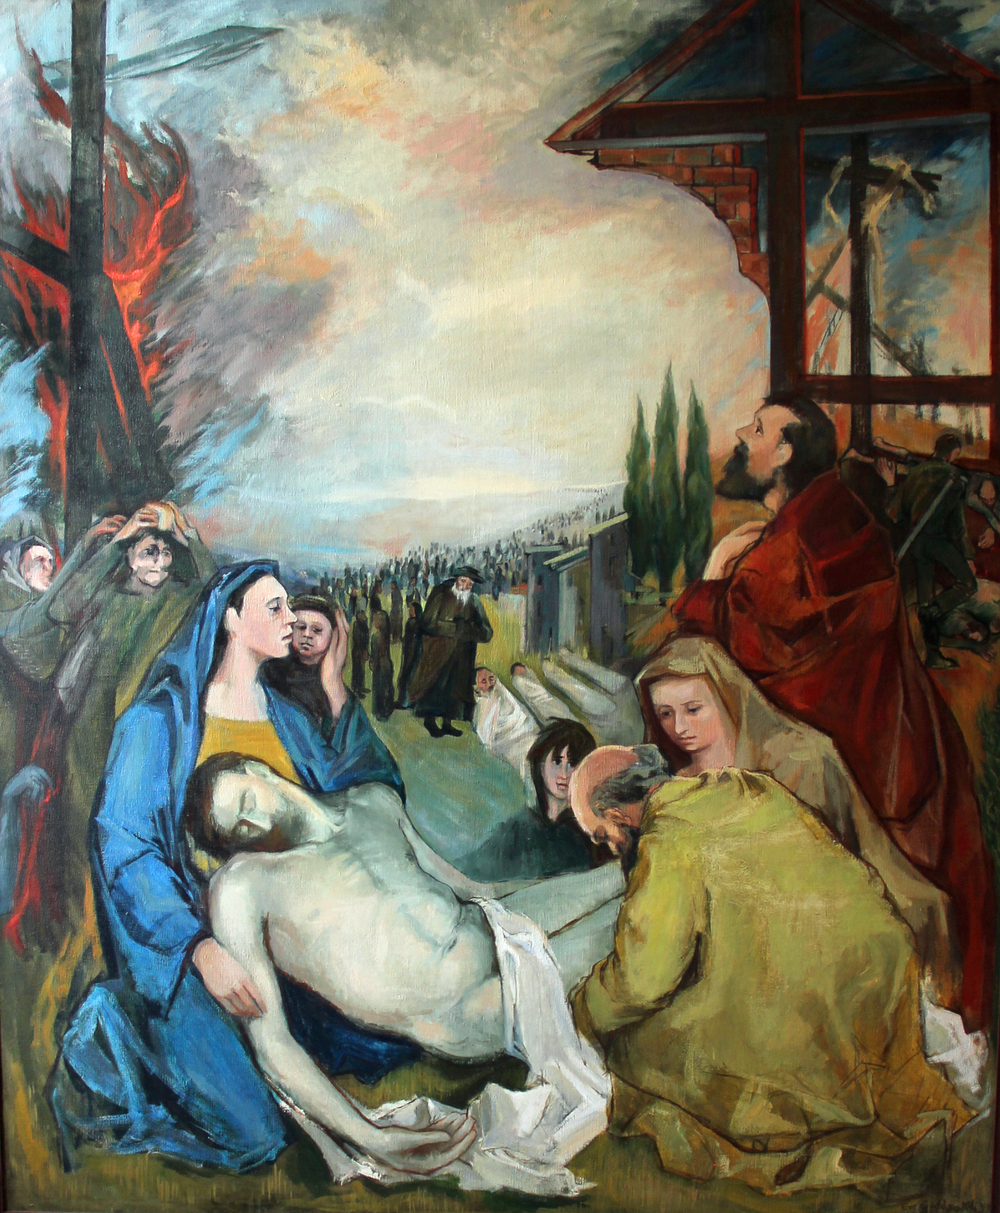 Crucifixions with Pieta